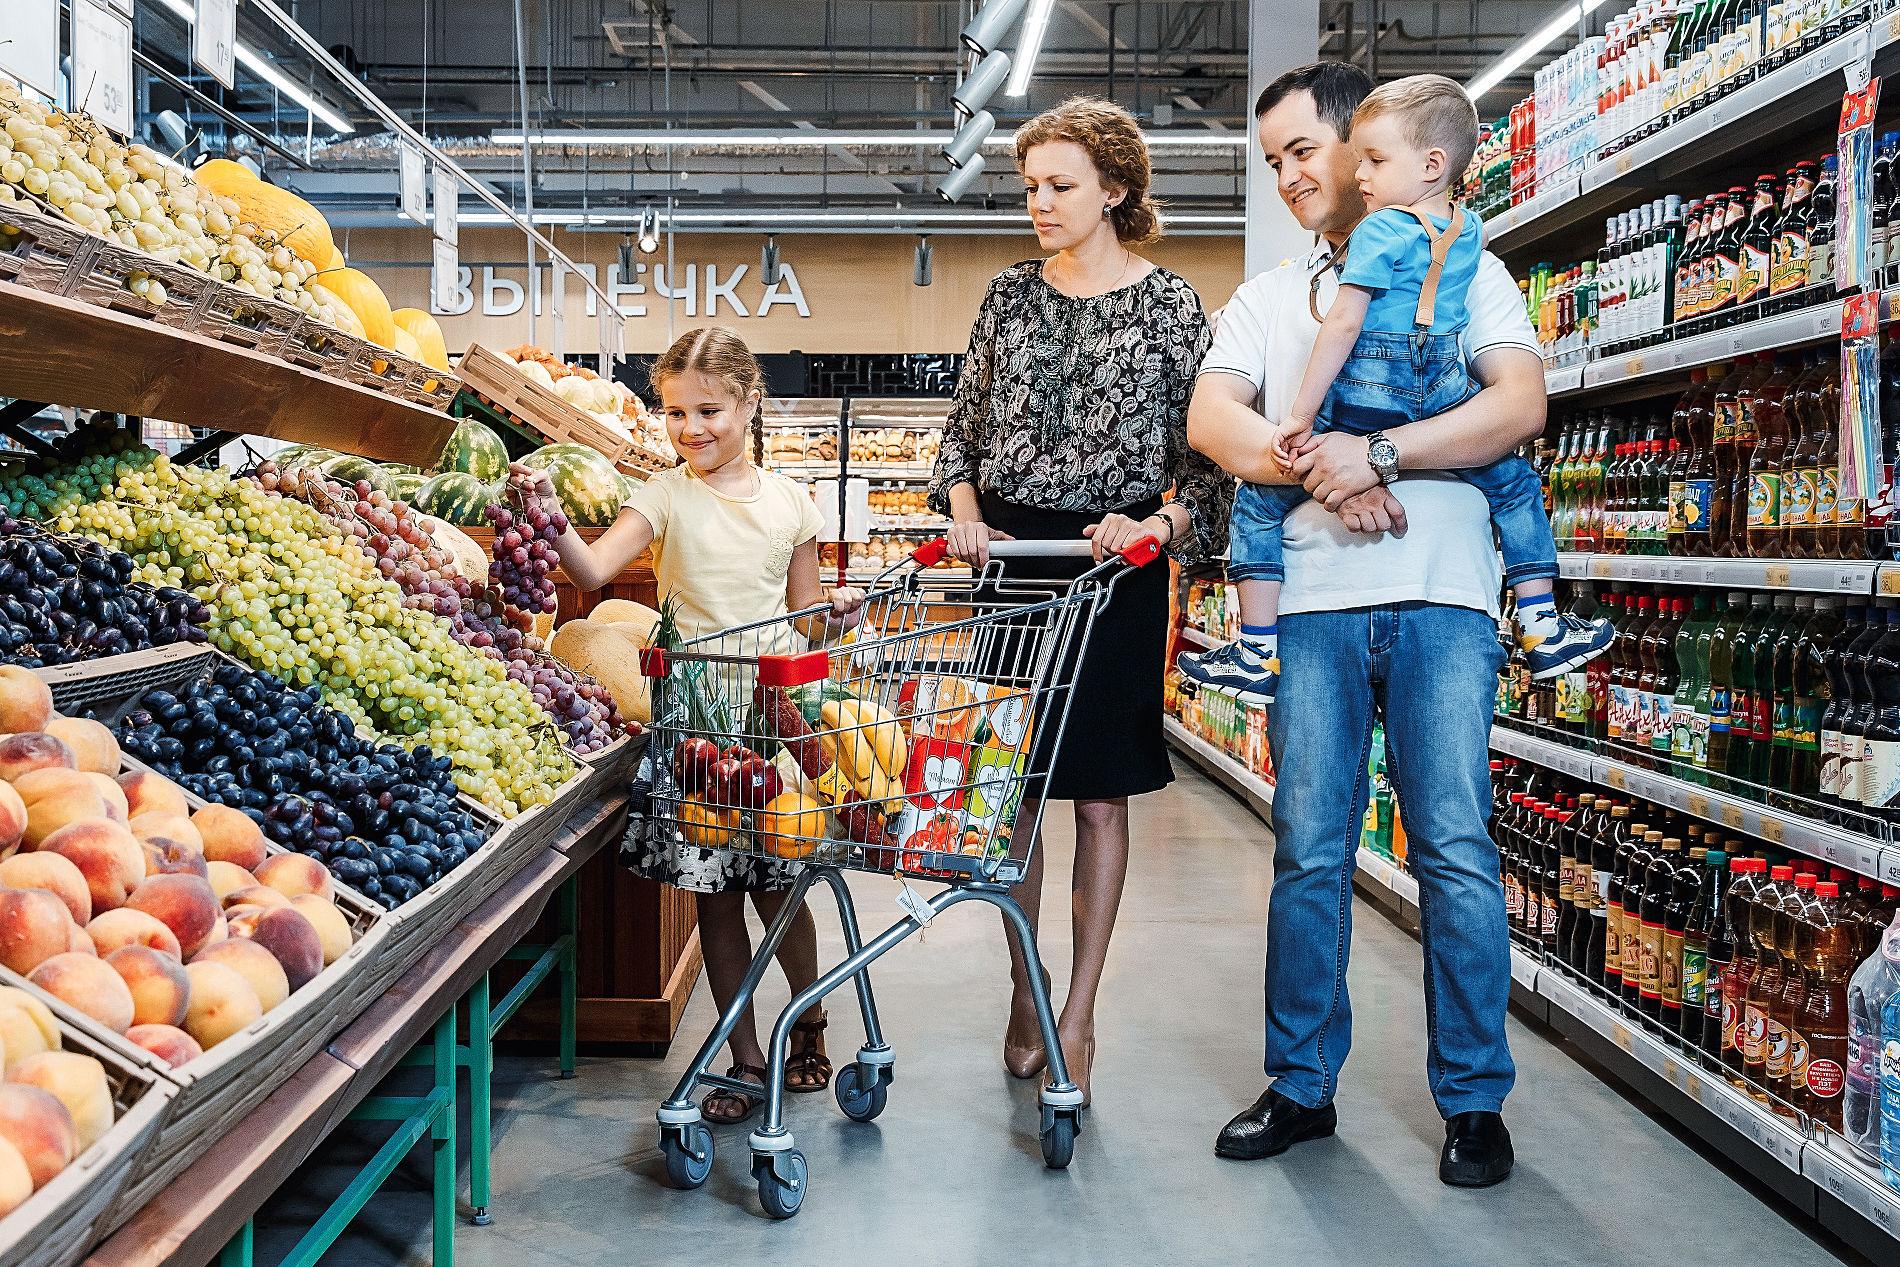 Картинки фото супермаркетах деньги